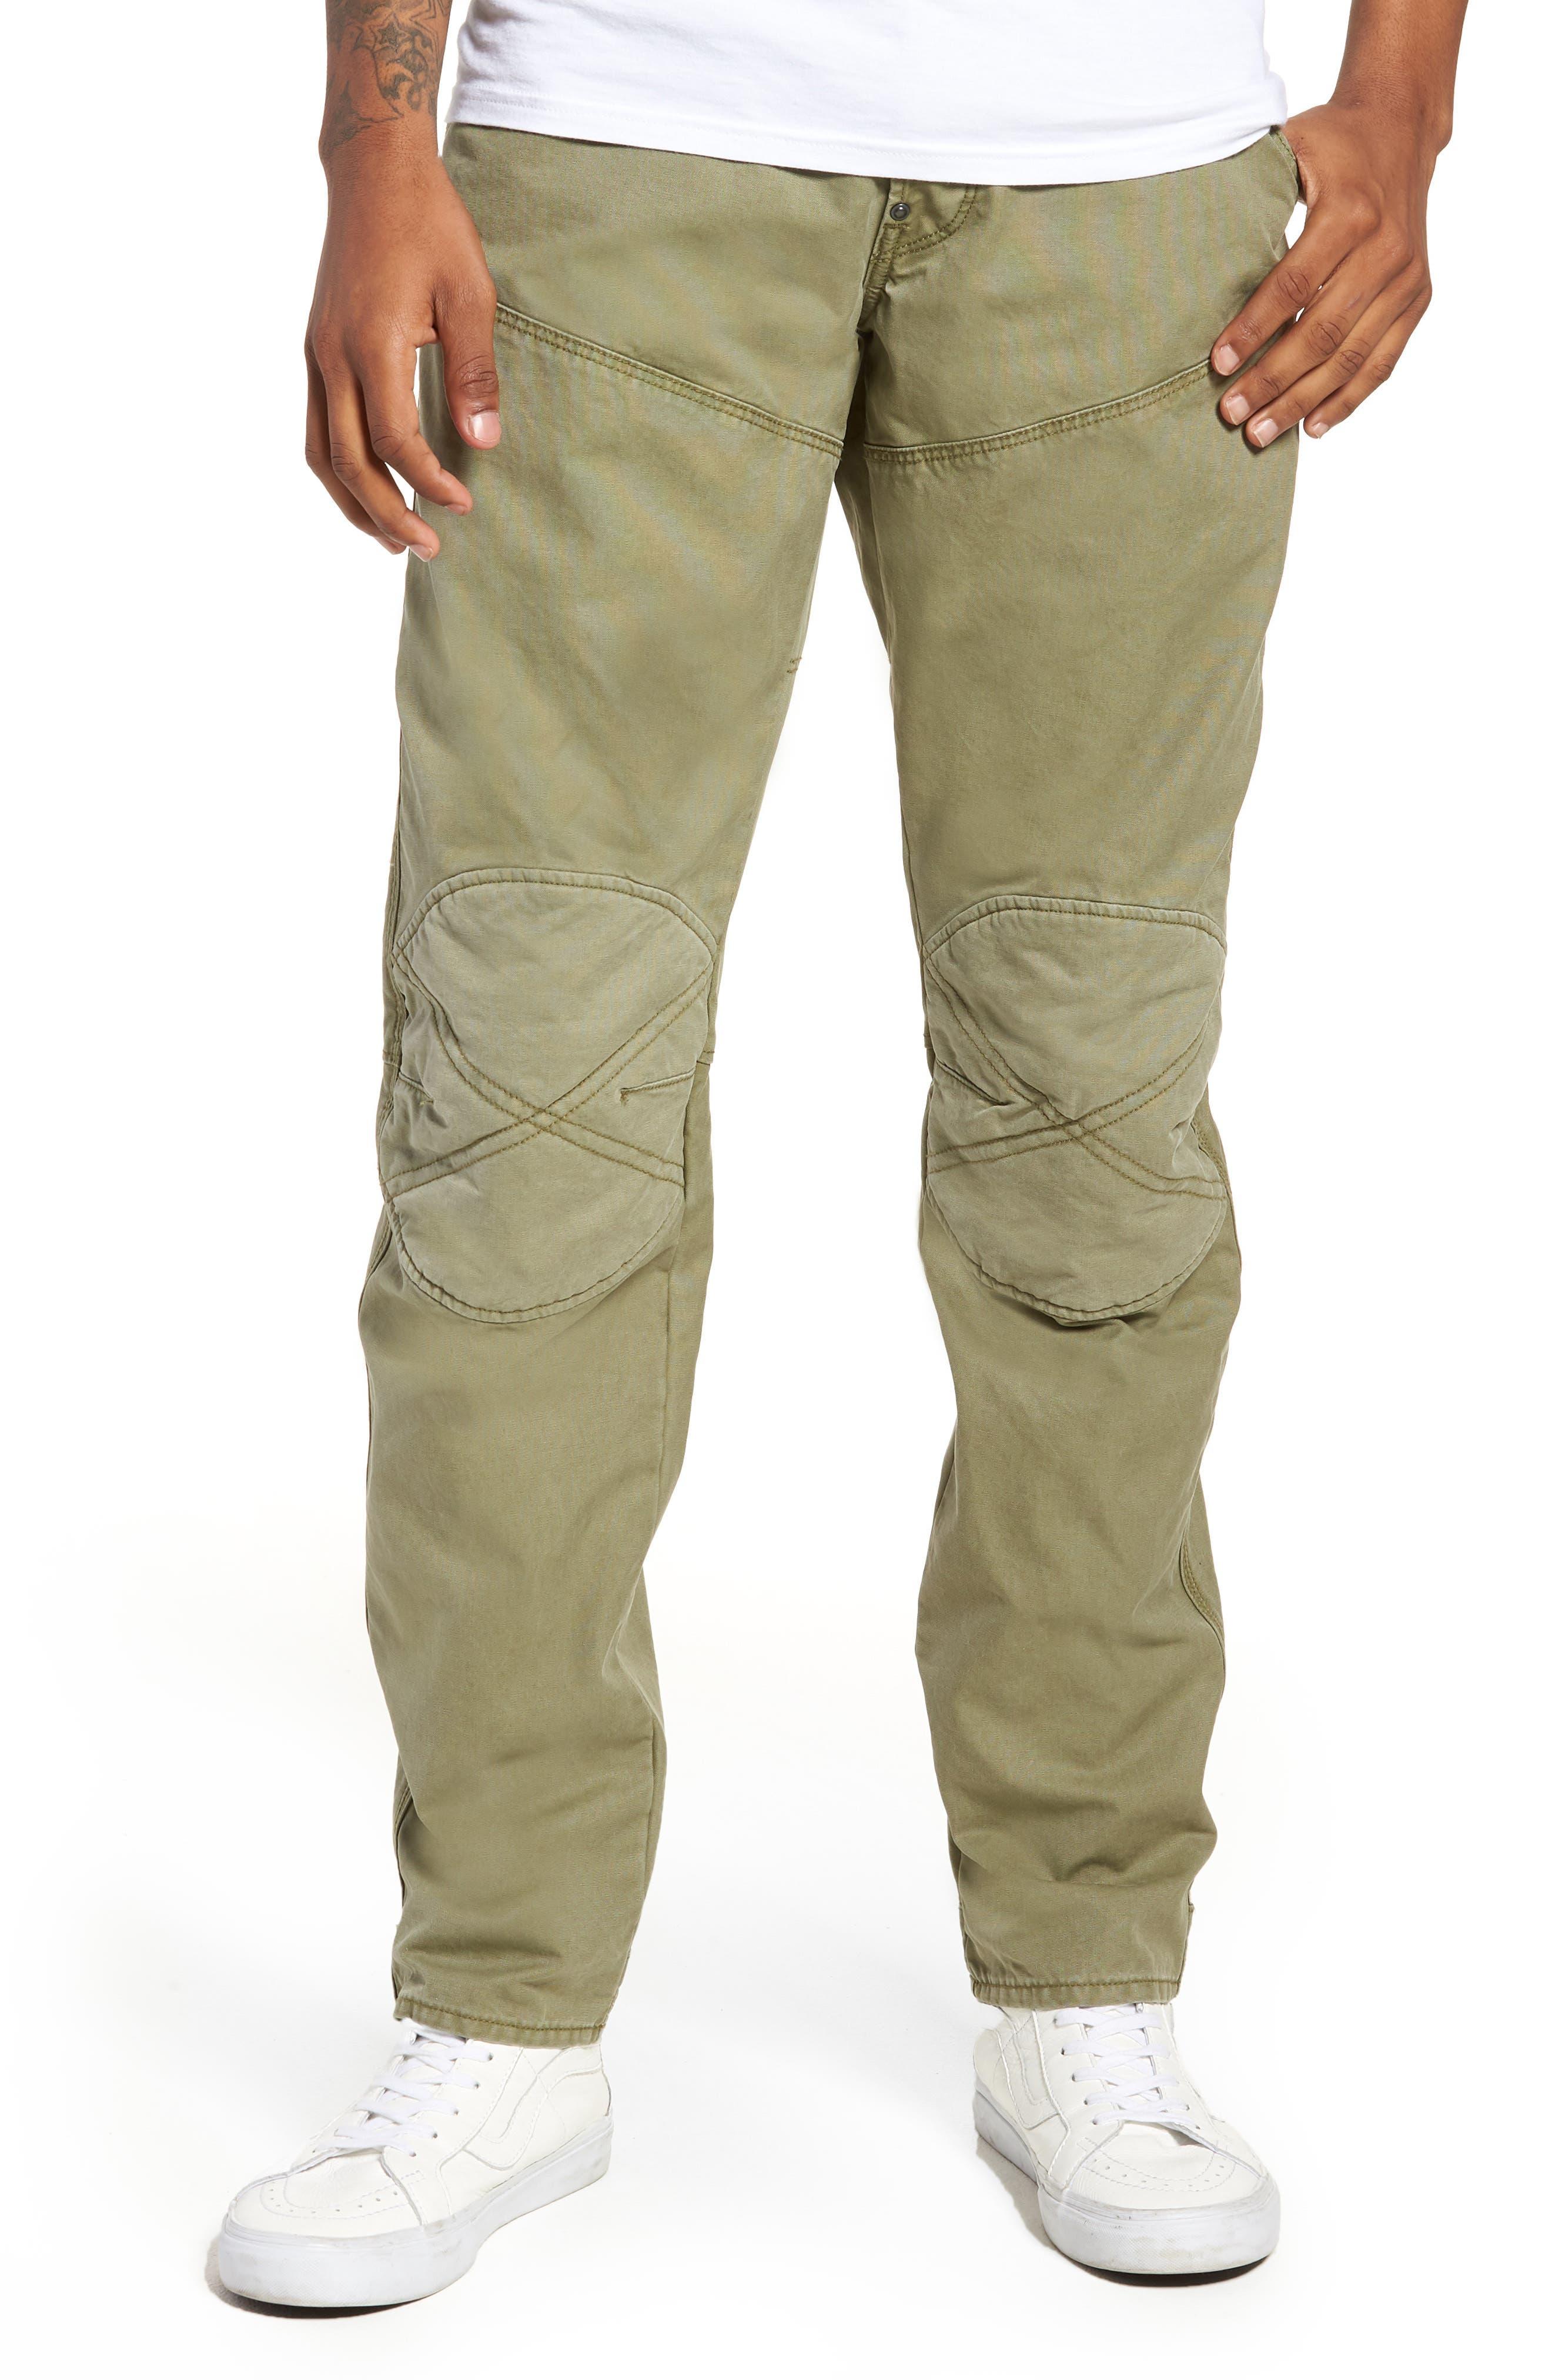 G-Star Raw 5620 Aefon 3D Slim Tapered Pants